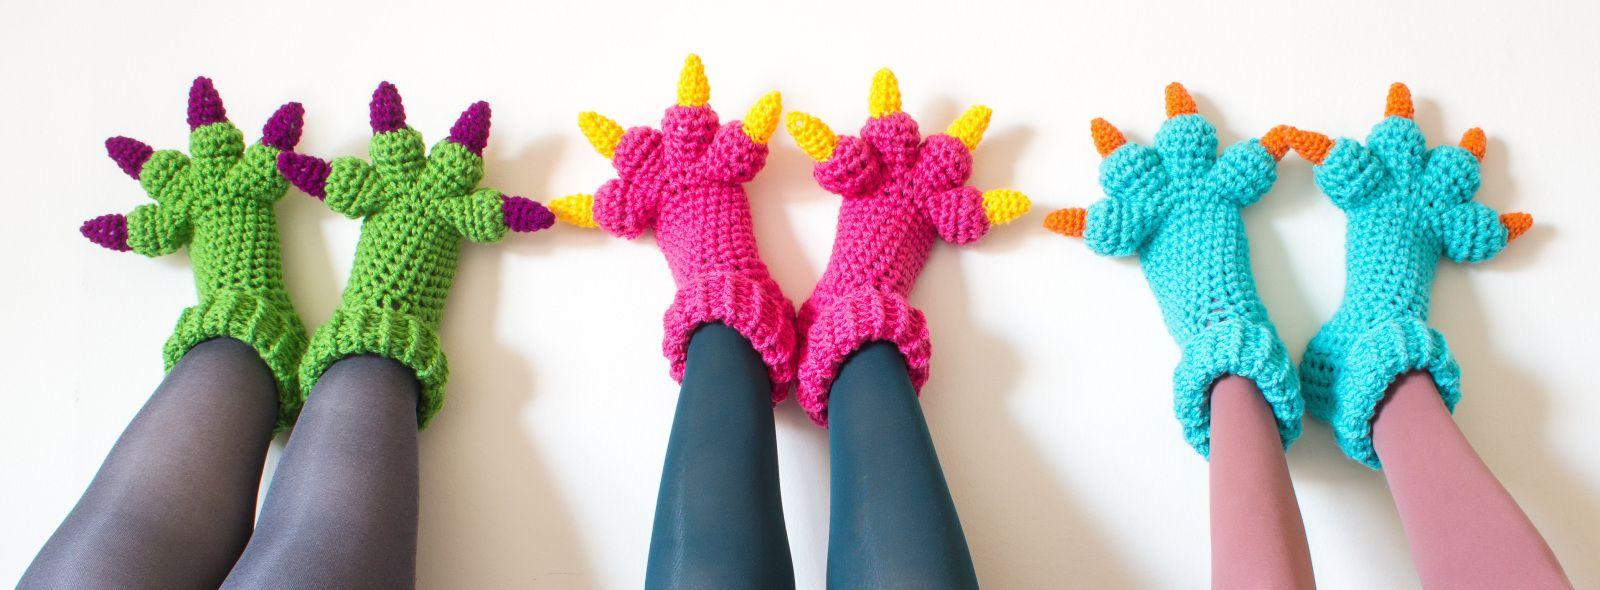 Monster slippers free beginner to intermediate crochet pattern monster slippers free beginner to intermediate crochet pattern bankloansurffo Choice Image